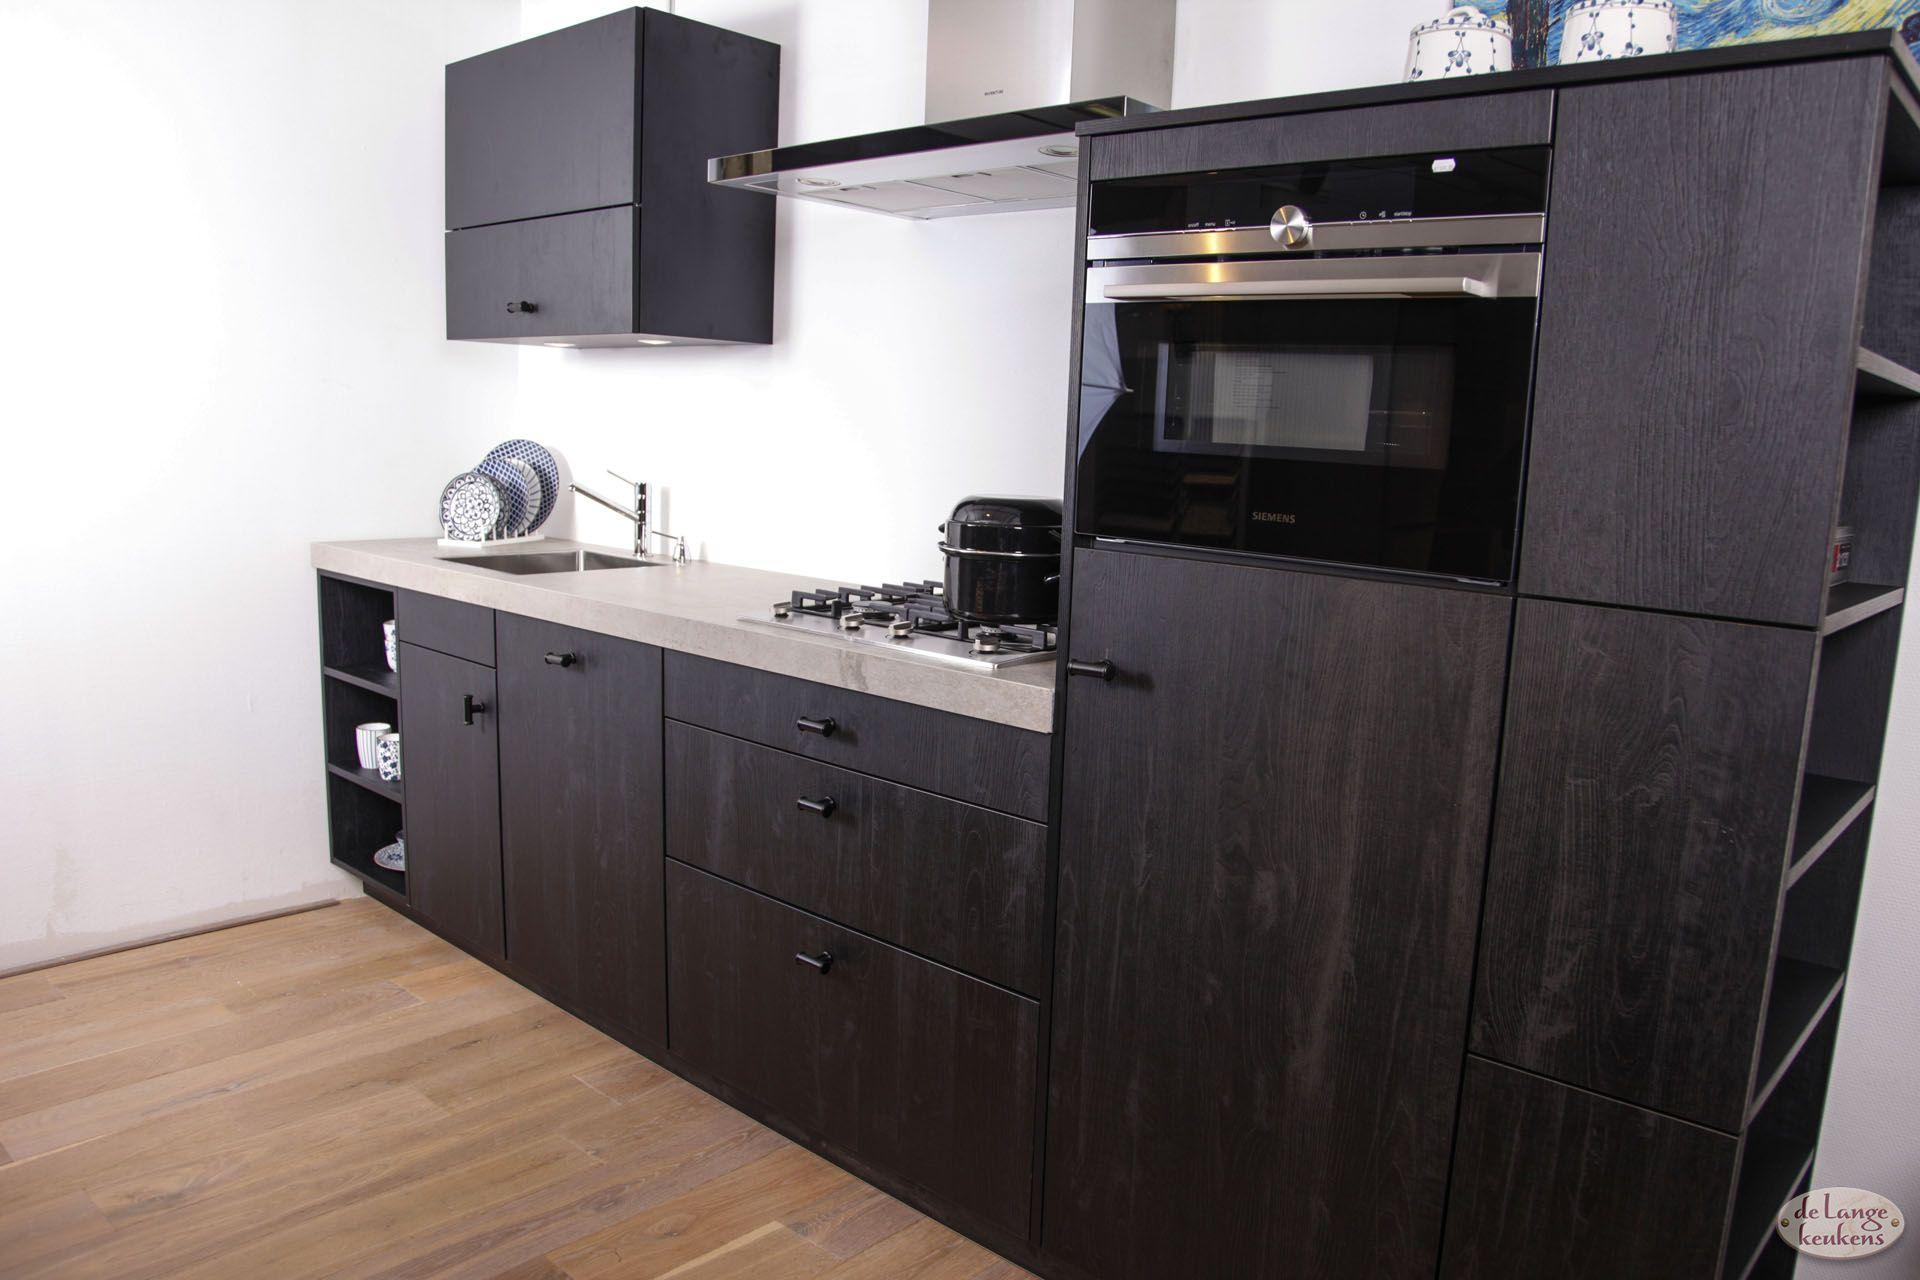 Gele Keuken 6 : Landelijke keuken sherwood black de lange keukens